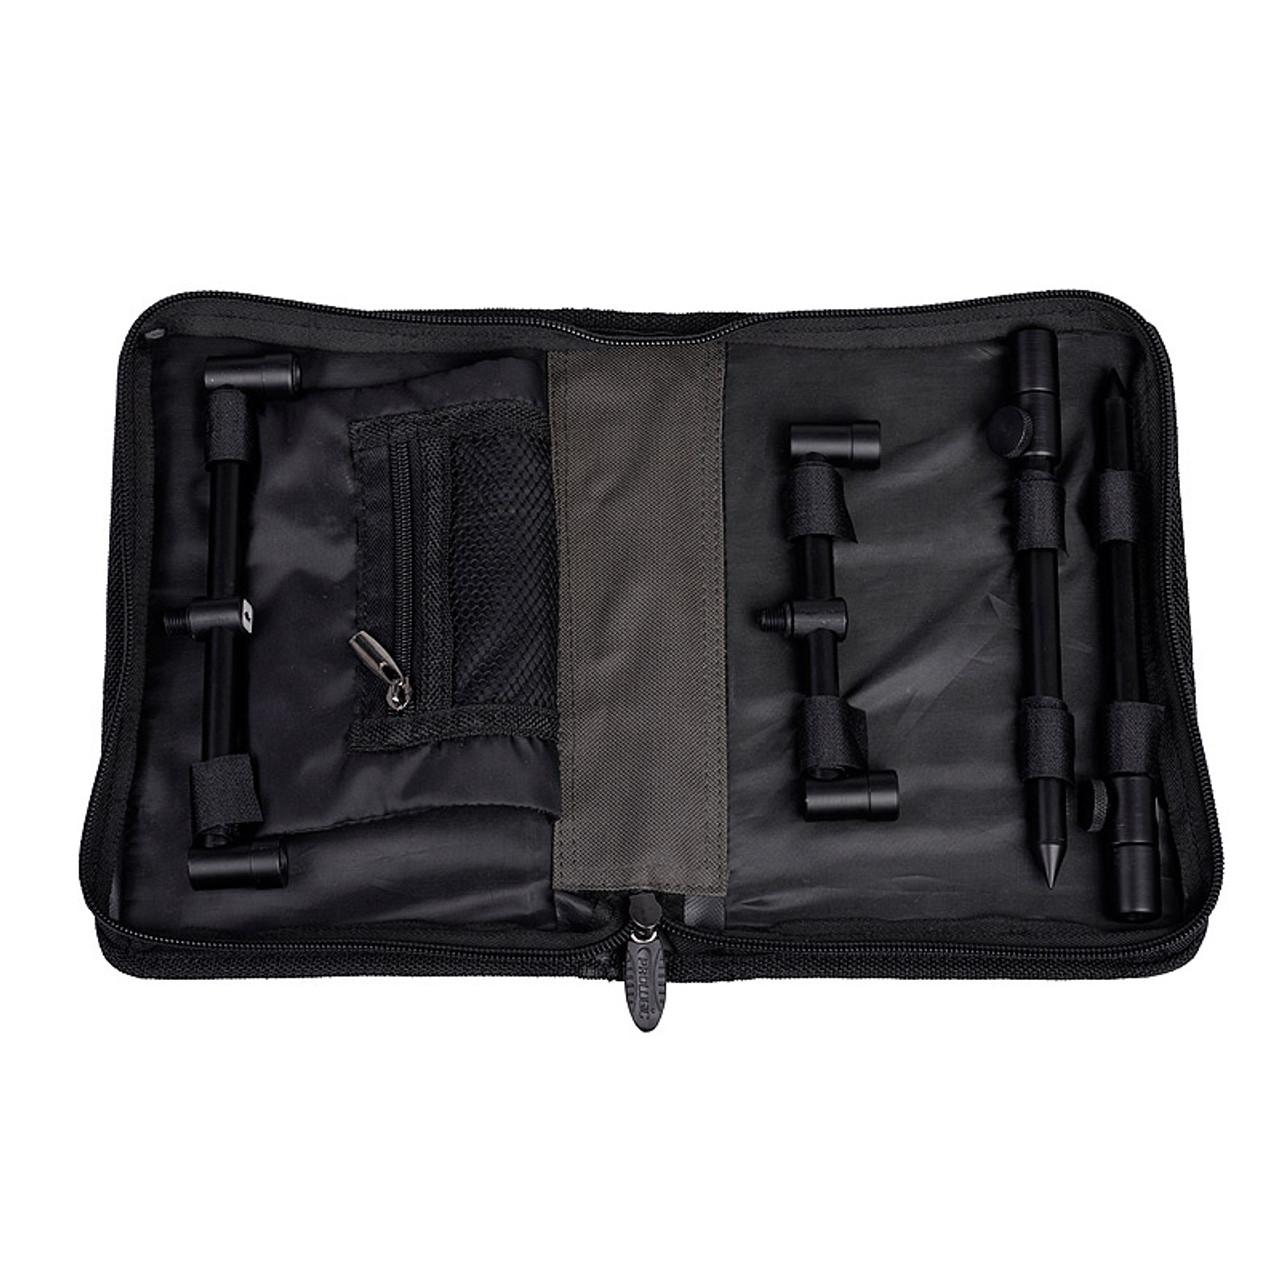 Prologic Black Fire Buzz & Sticks Kit